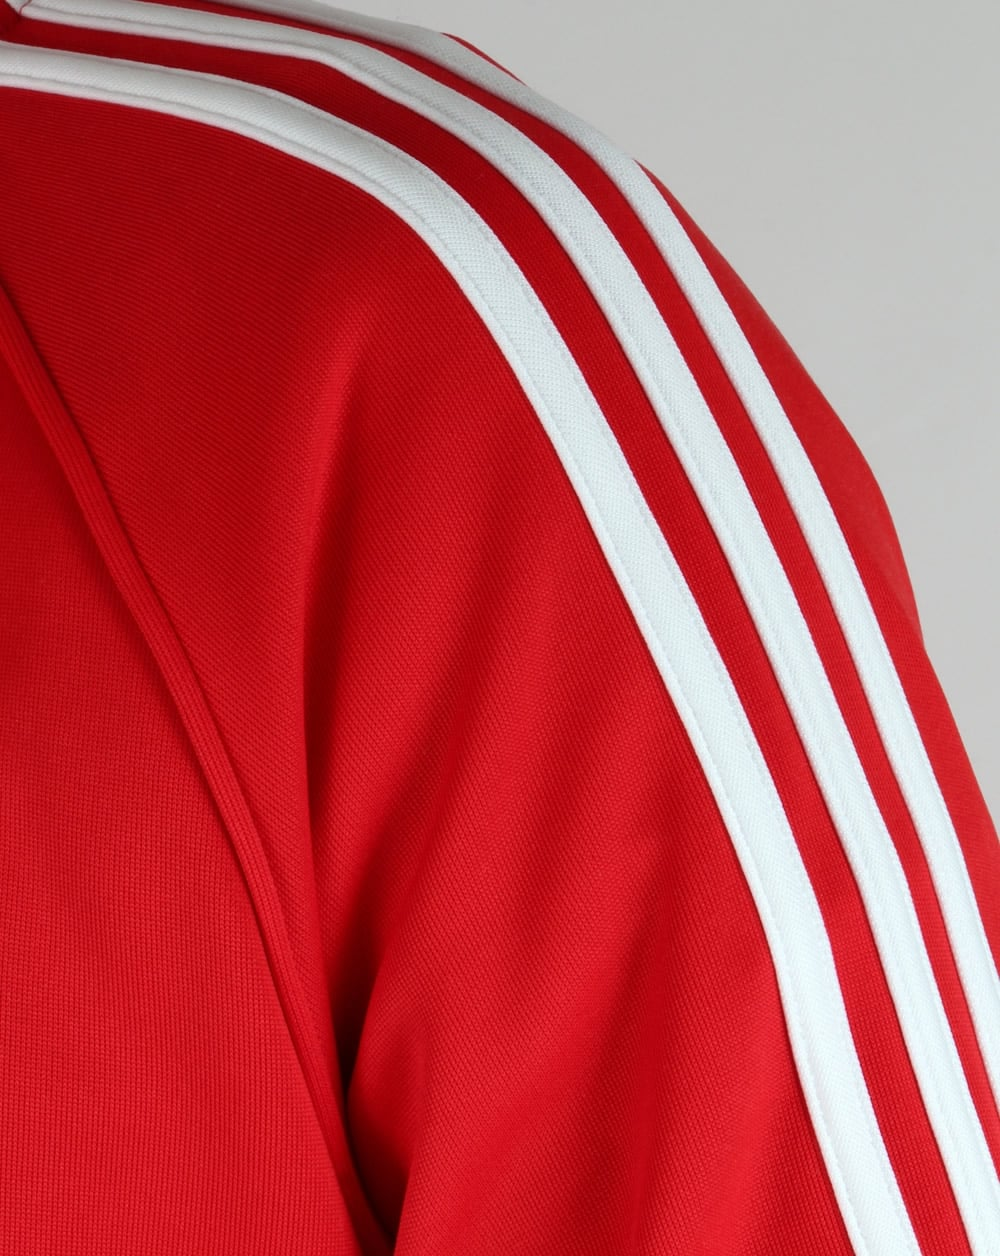 Adidas Originals Superstar Hommes Velour Rouge Survêtement RDHvdC